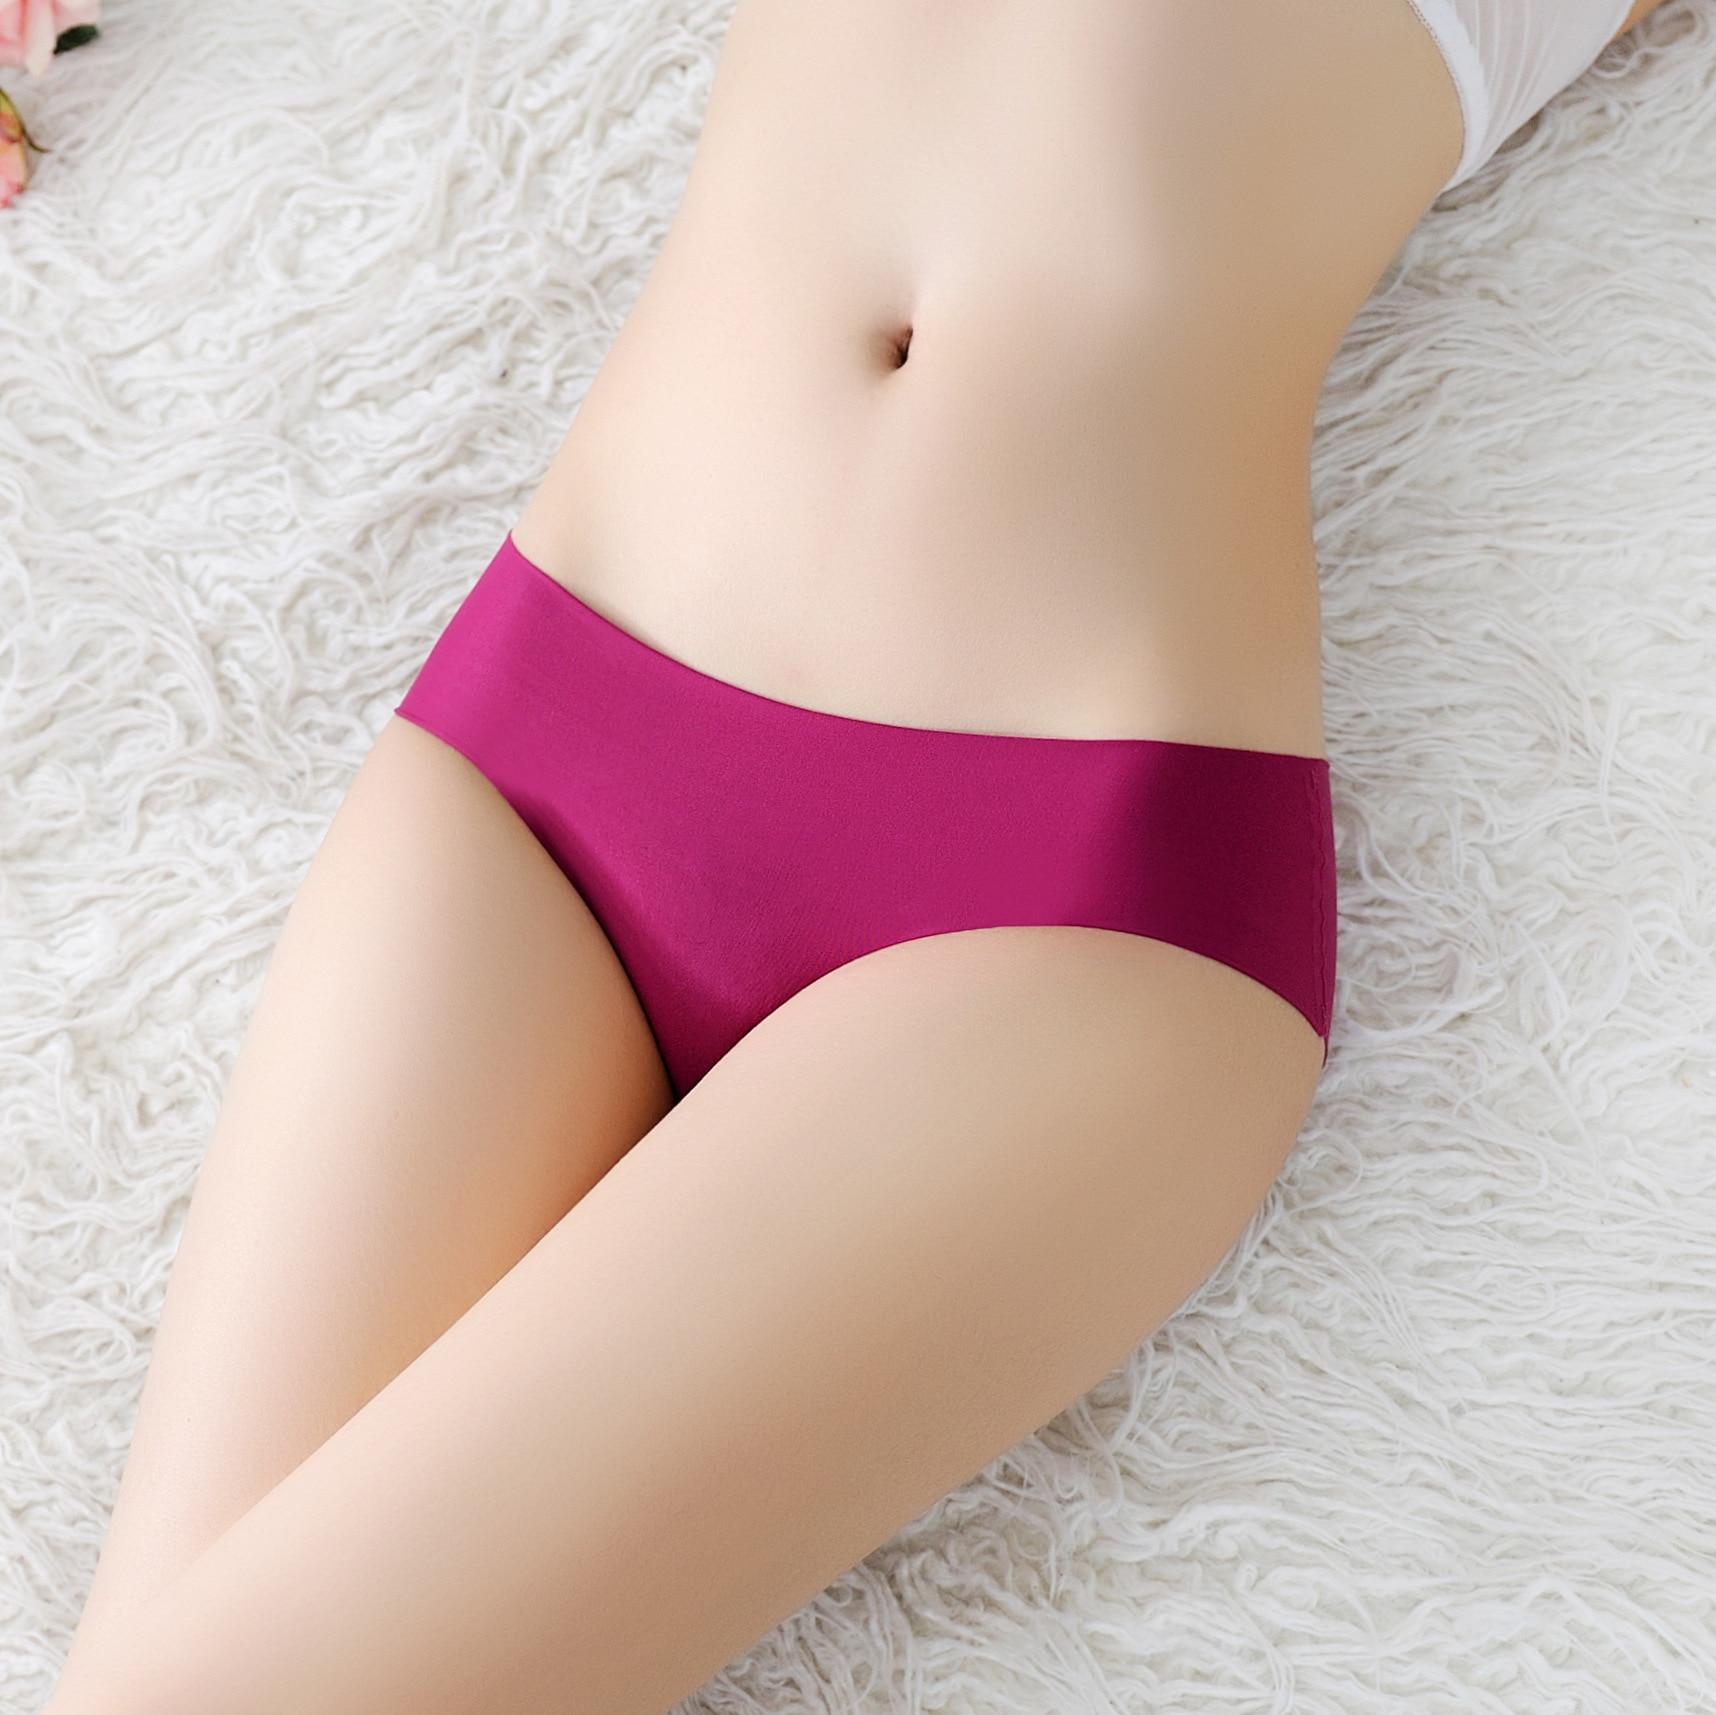 Low Waist Seamless Underwear Pink Women Female Solid Ladies Panties Lingerie Sexy Seamless Panties Women Silk Intimates Briefs